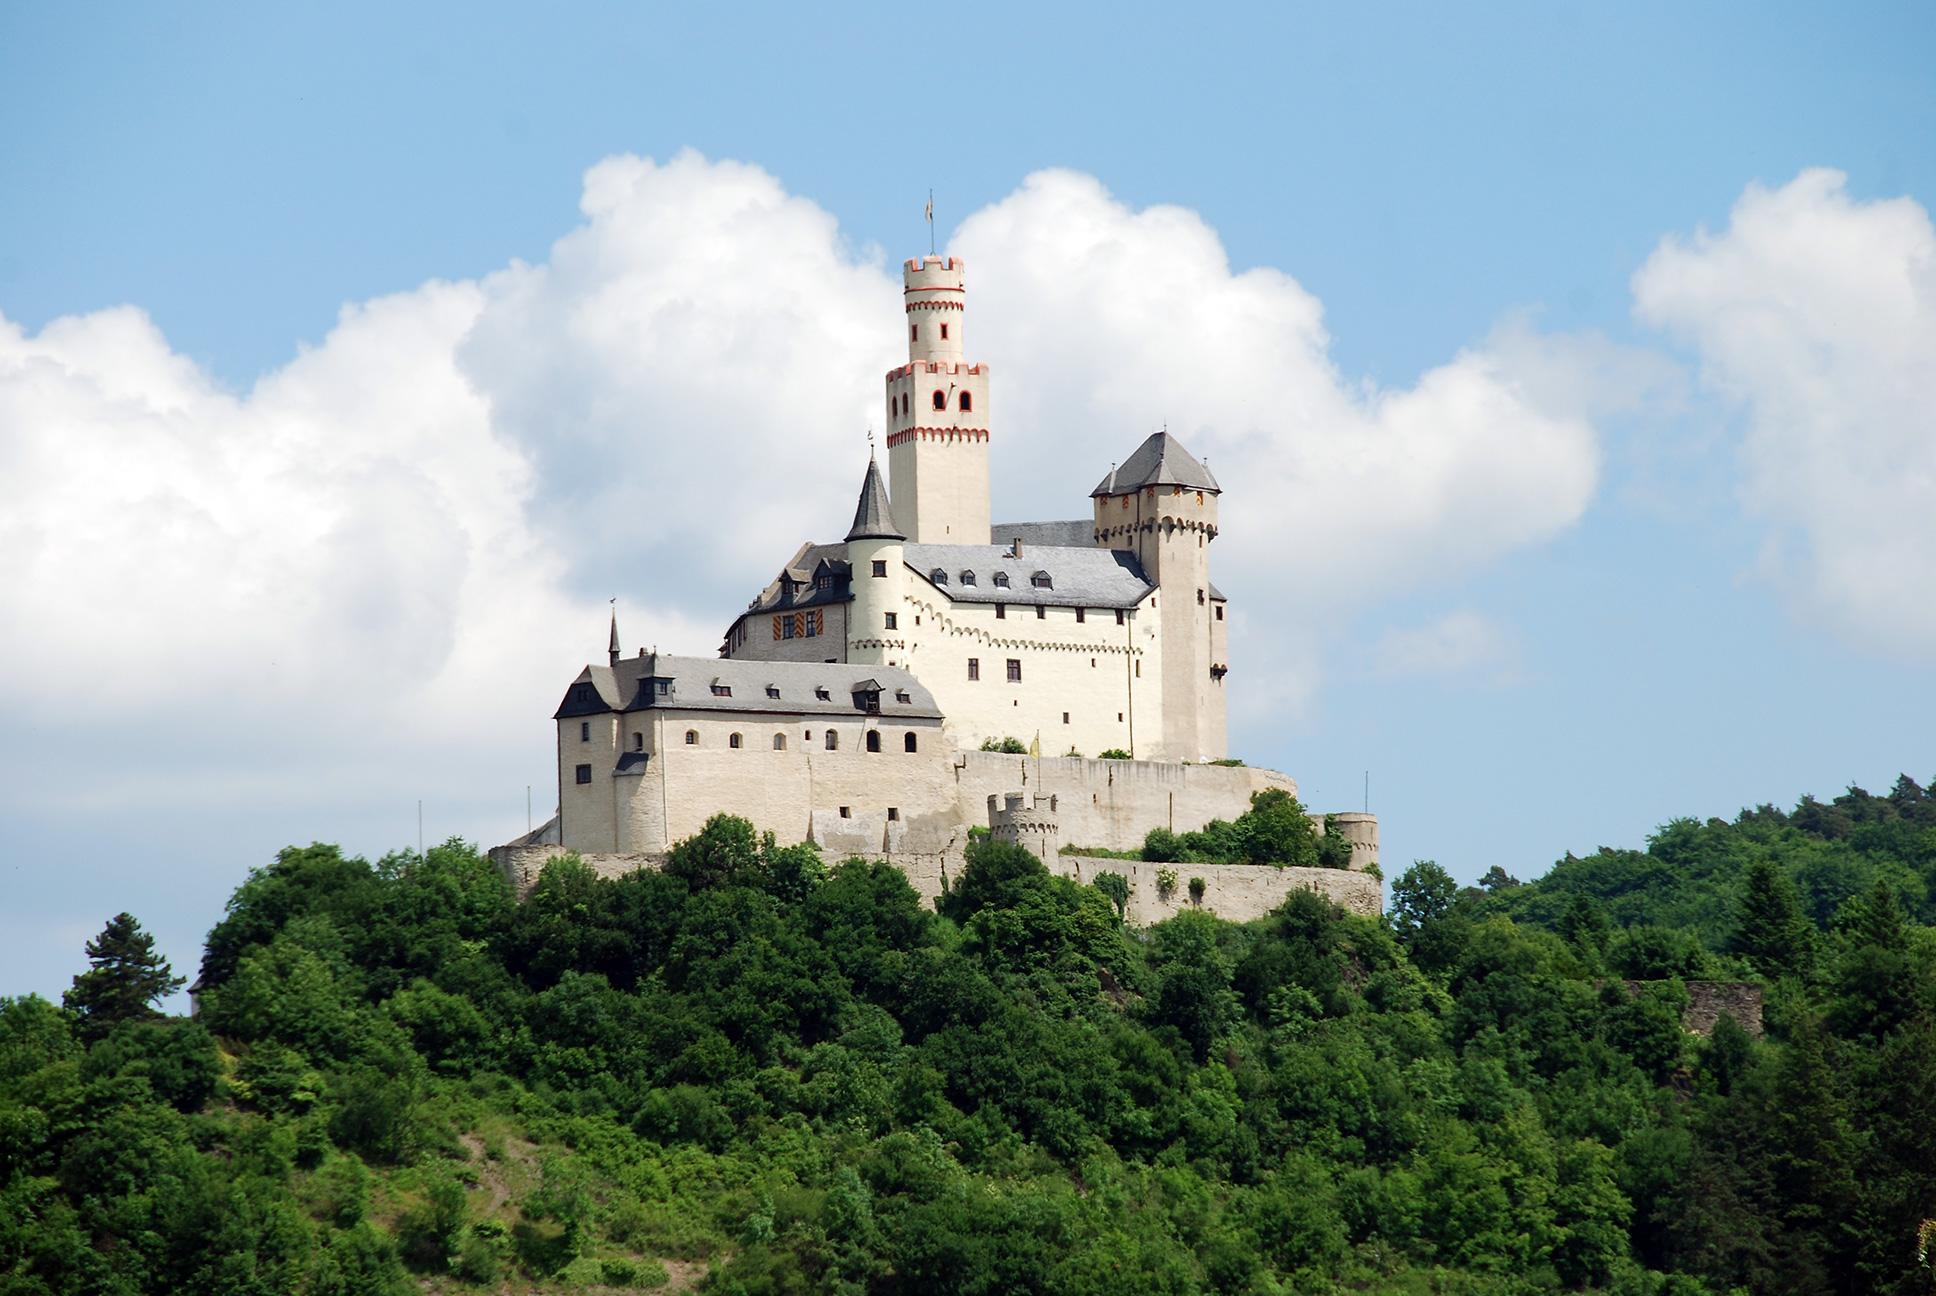 Enchanting Europe - Germany, Koblenz, Marksburg Castle